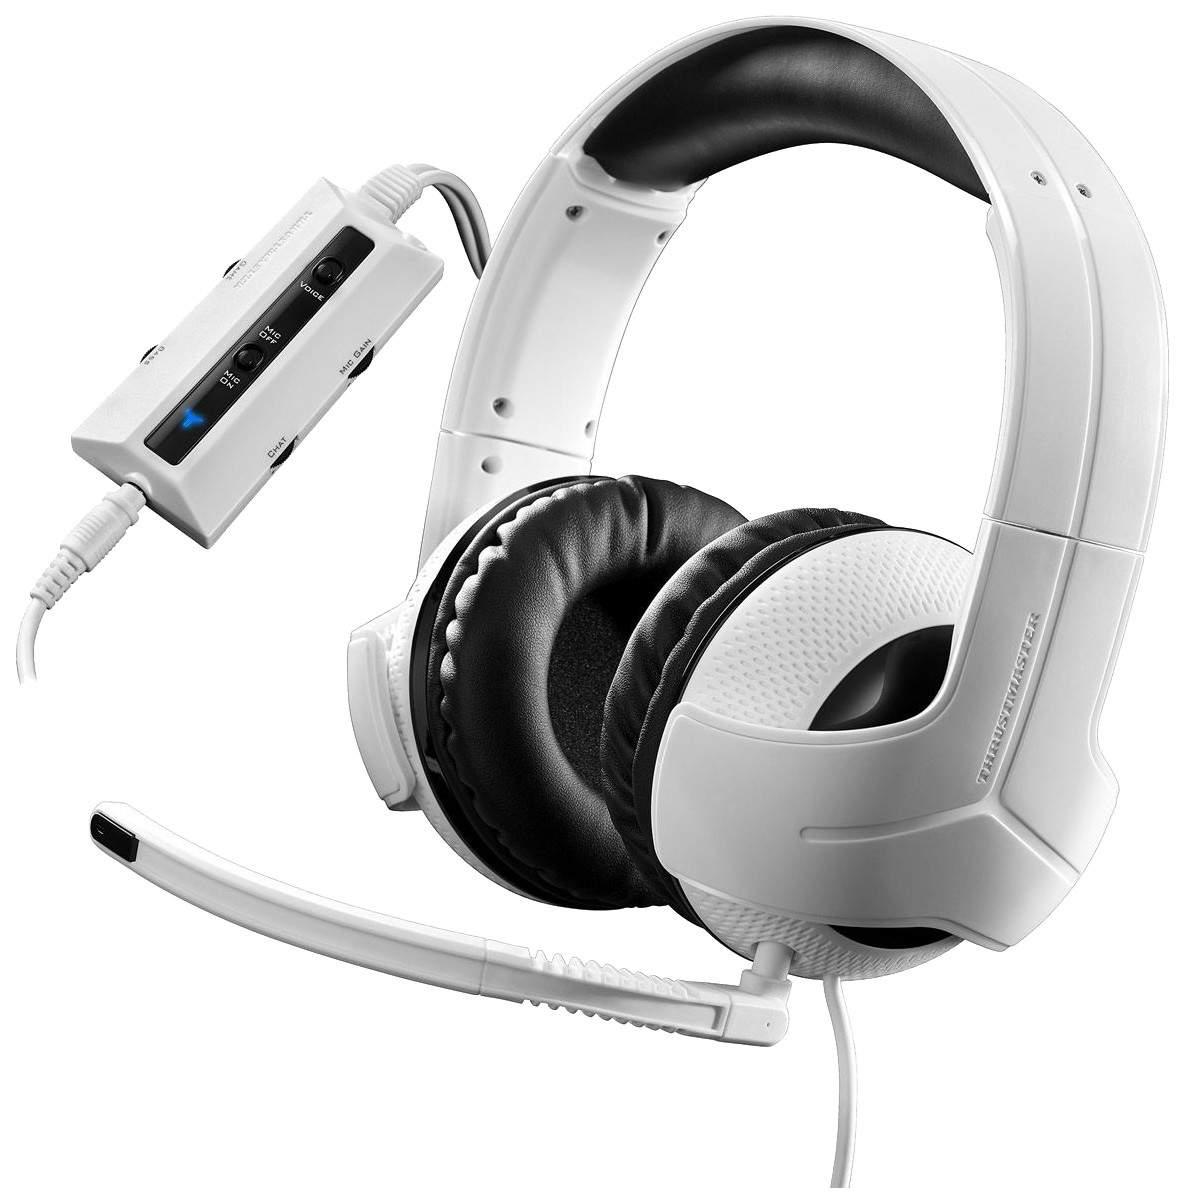 Гарнитура игровая Thrustmaster Y300CPX для PS4 / PS3 / PC / Xbox One